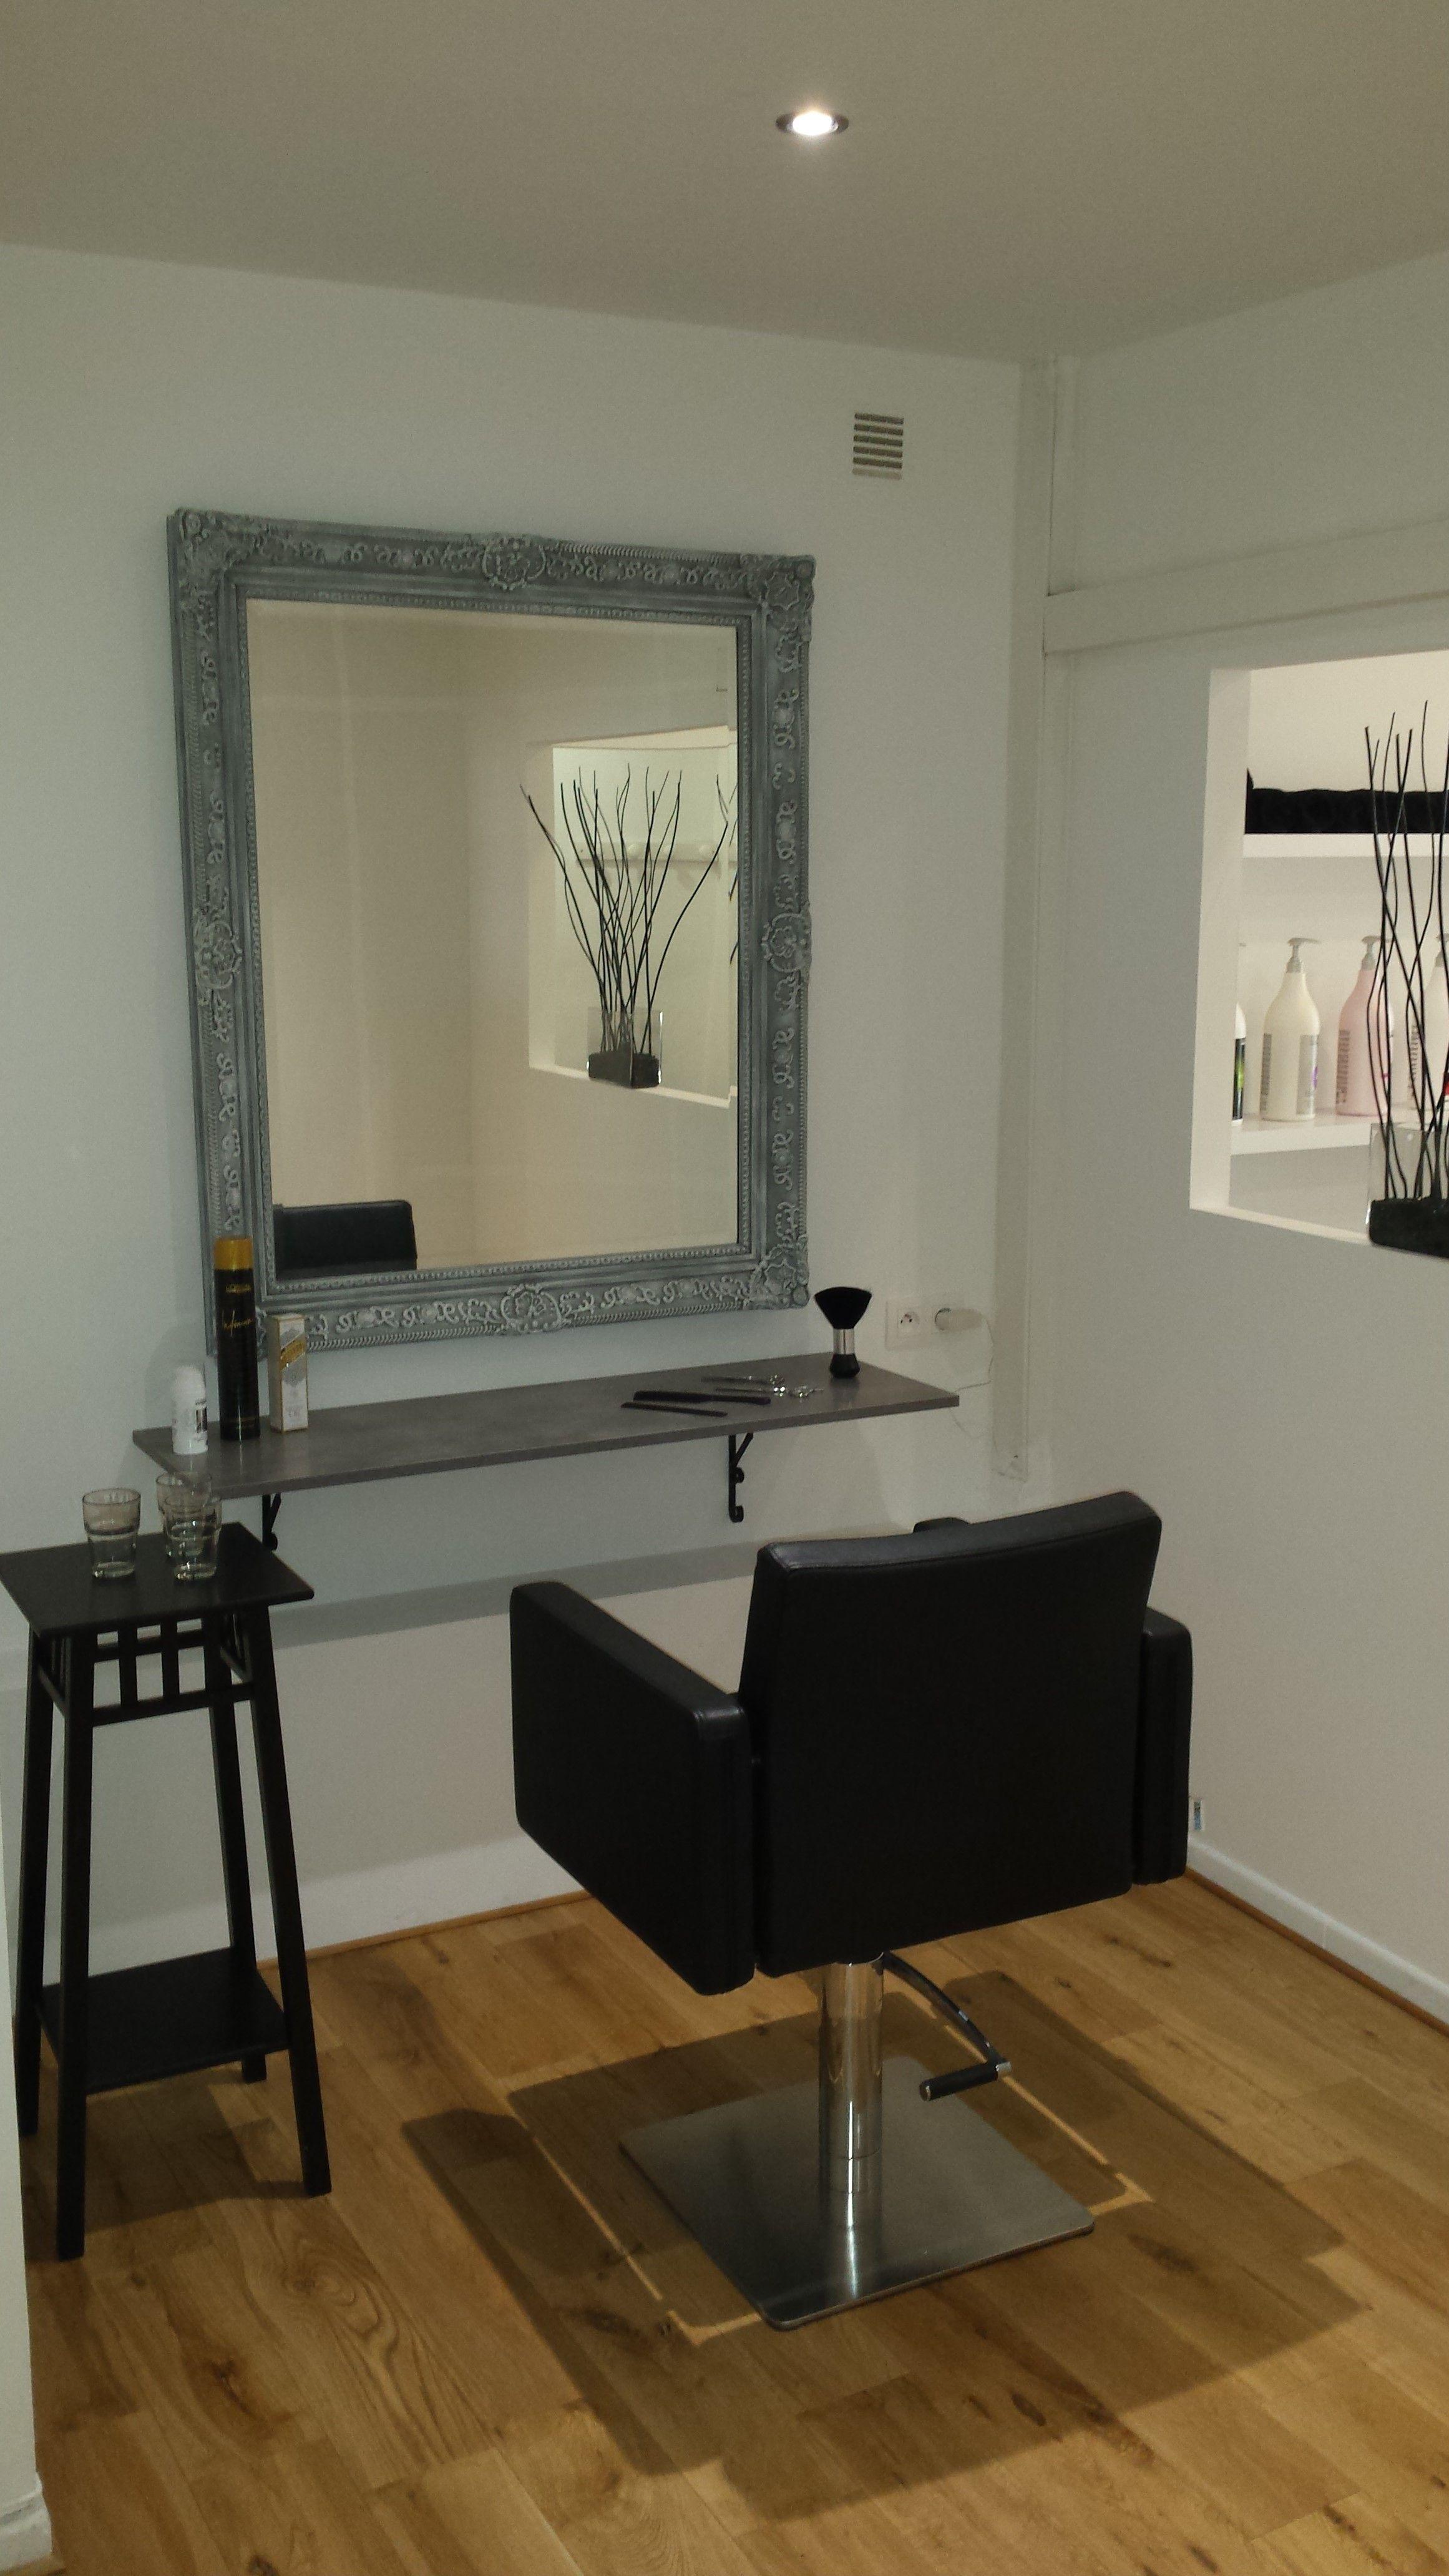 salon de coiffure chignons mariage privatif | salon coiffure ...